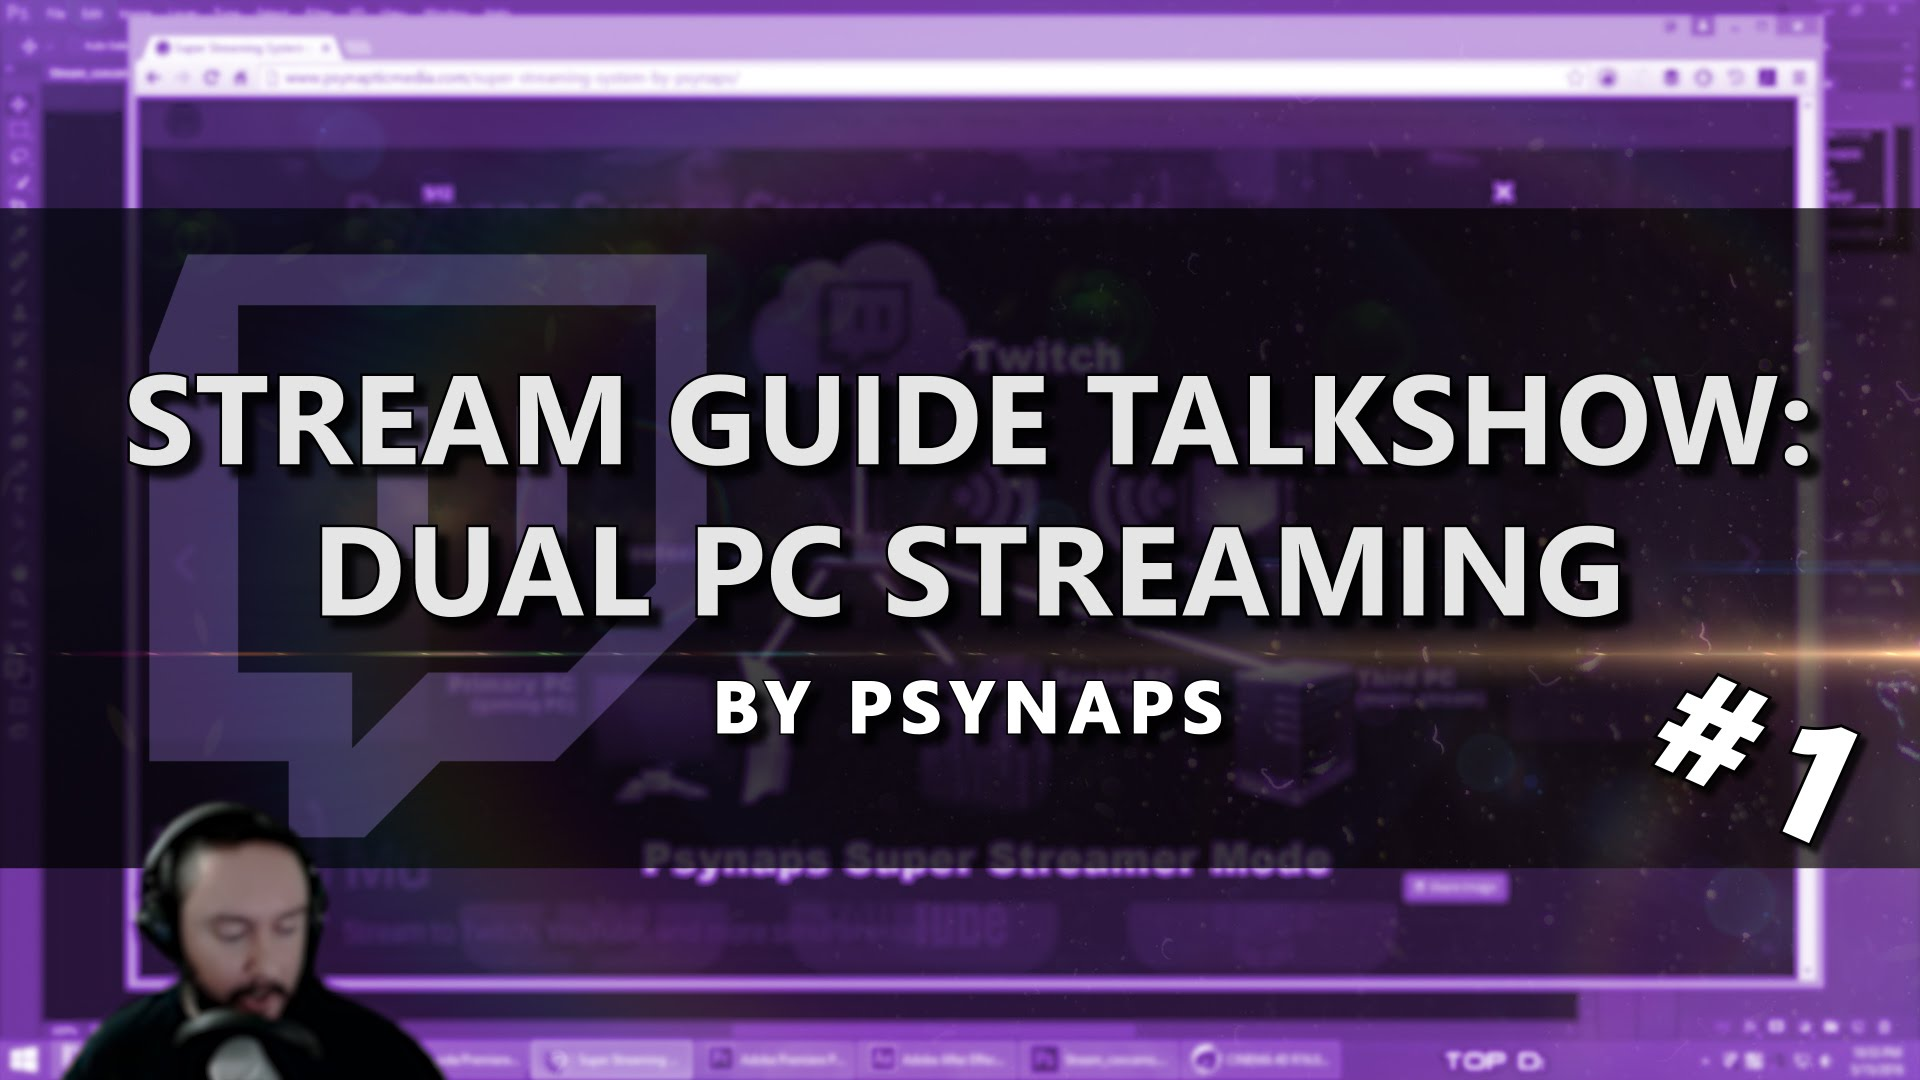 Dual PC Streaming Setup – Stream Guide Talk Show (Part 1/4)